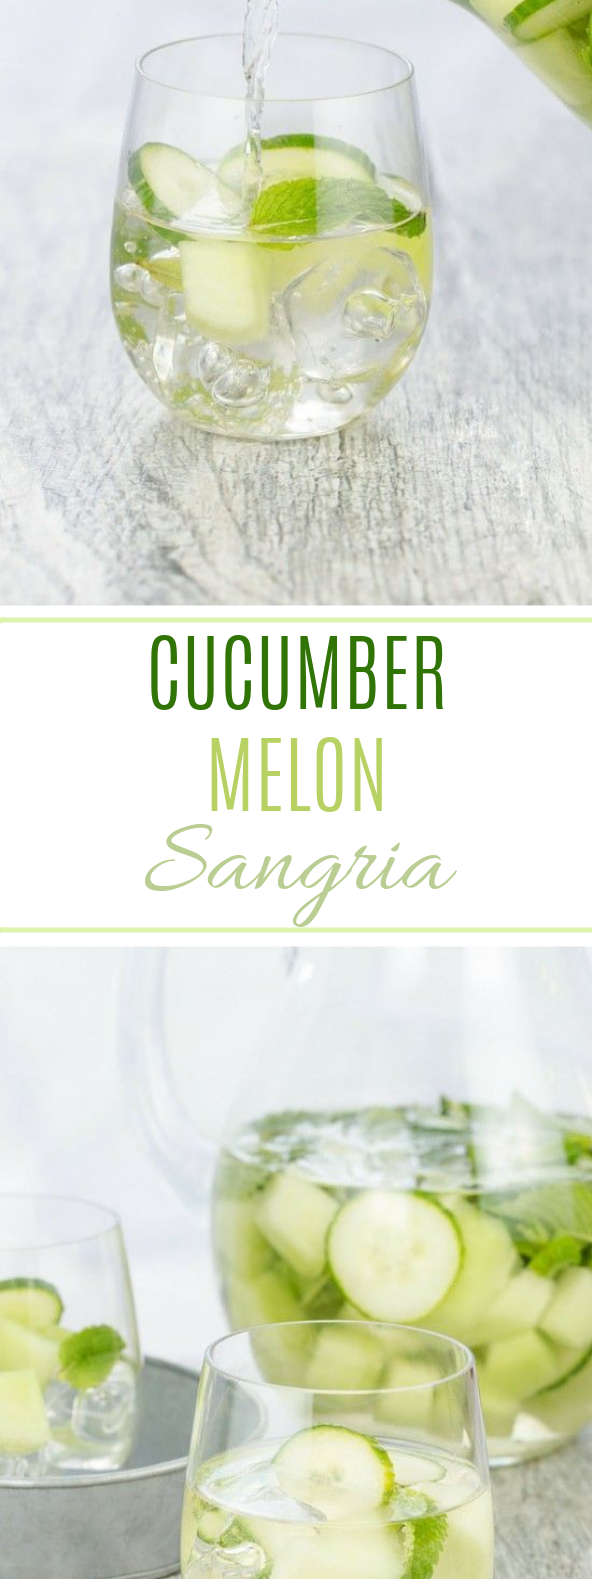 Cucumber Melon Sangria #drinks #summer